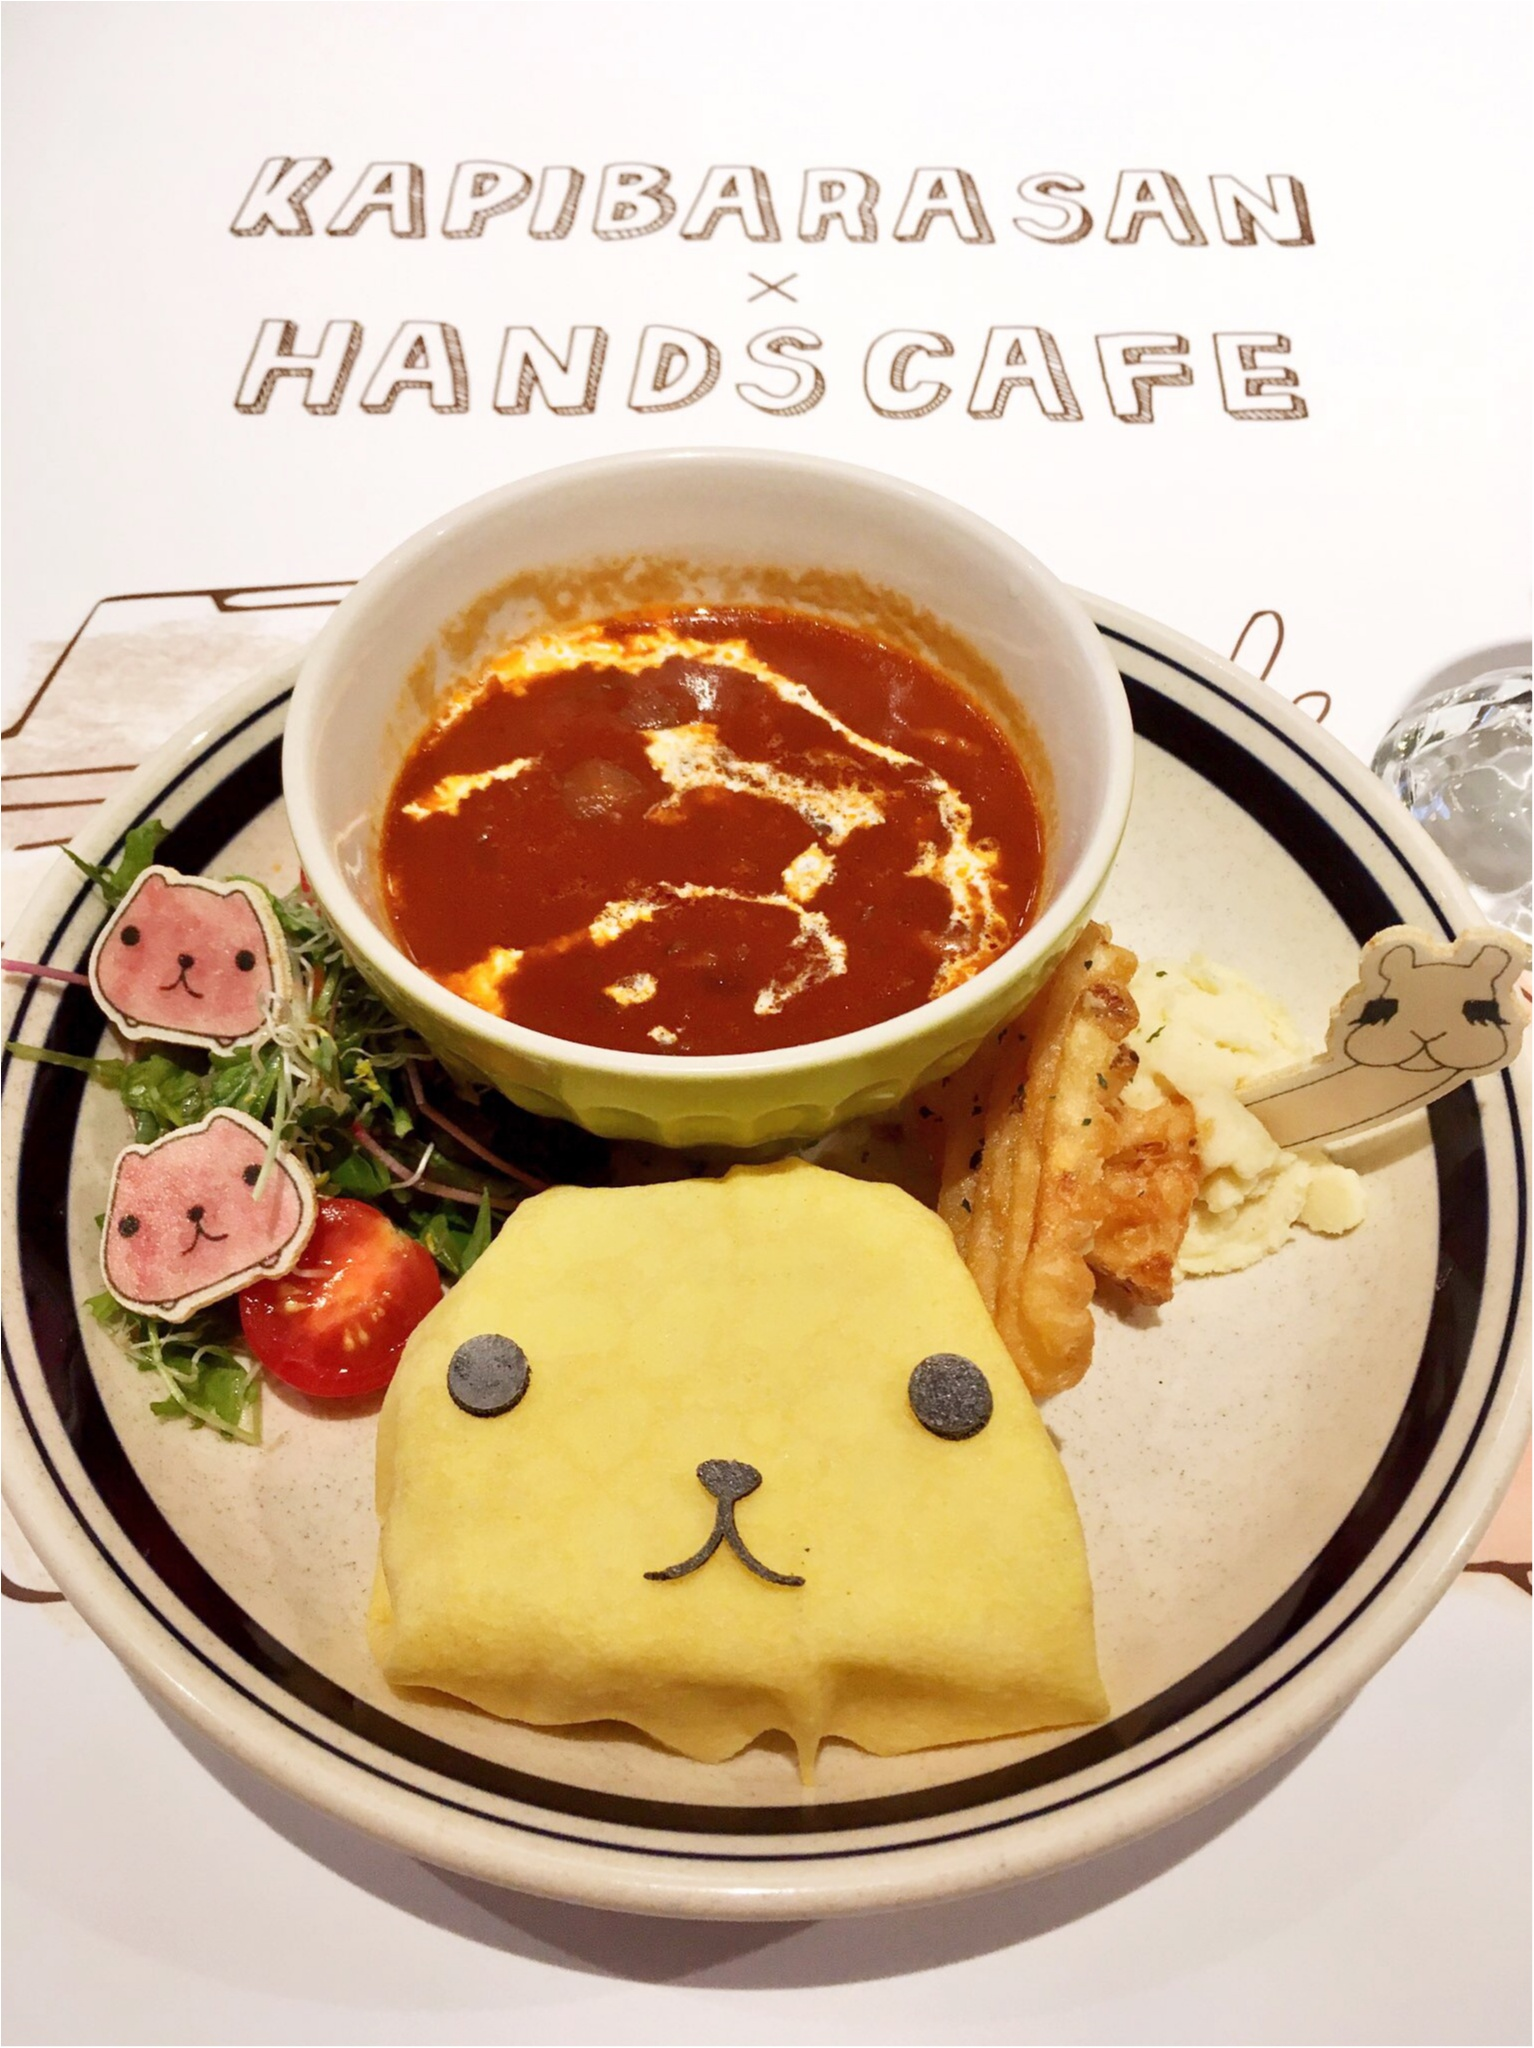 『KAPIBARASAN×HANDS CAFE』@東急表参道原宿店♡りぃイチオシメニューのご紹介(∗•ω•∗)♡_4